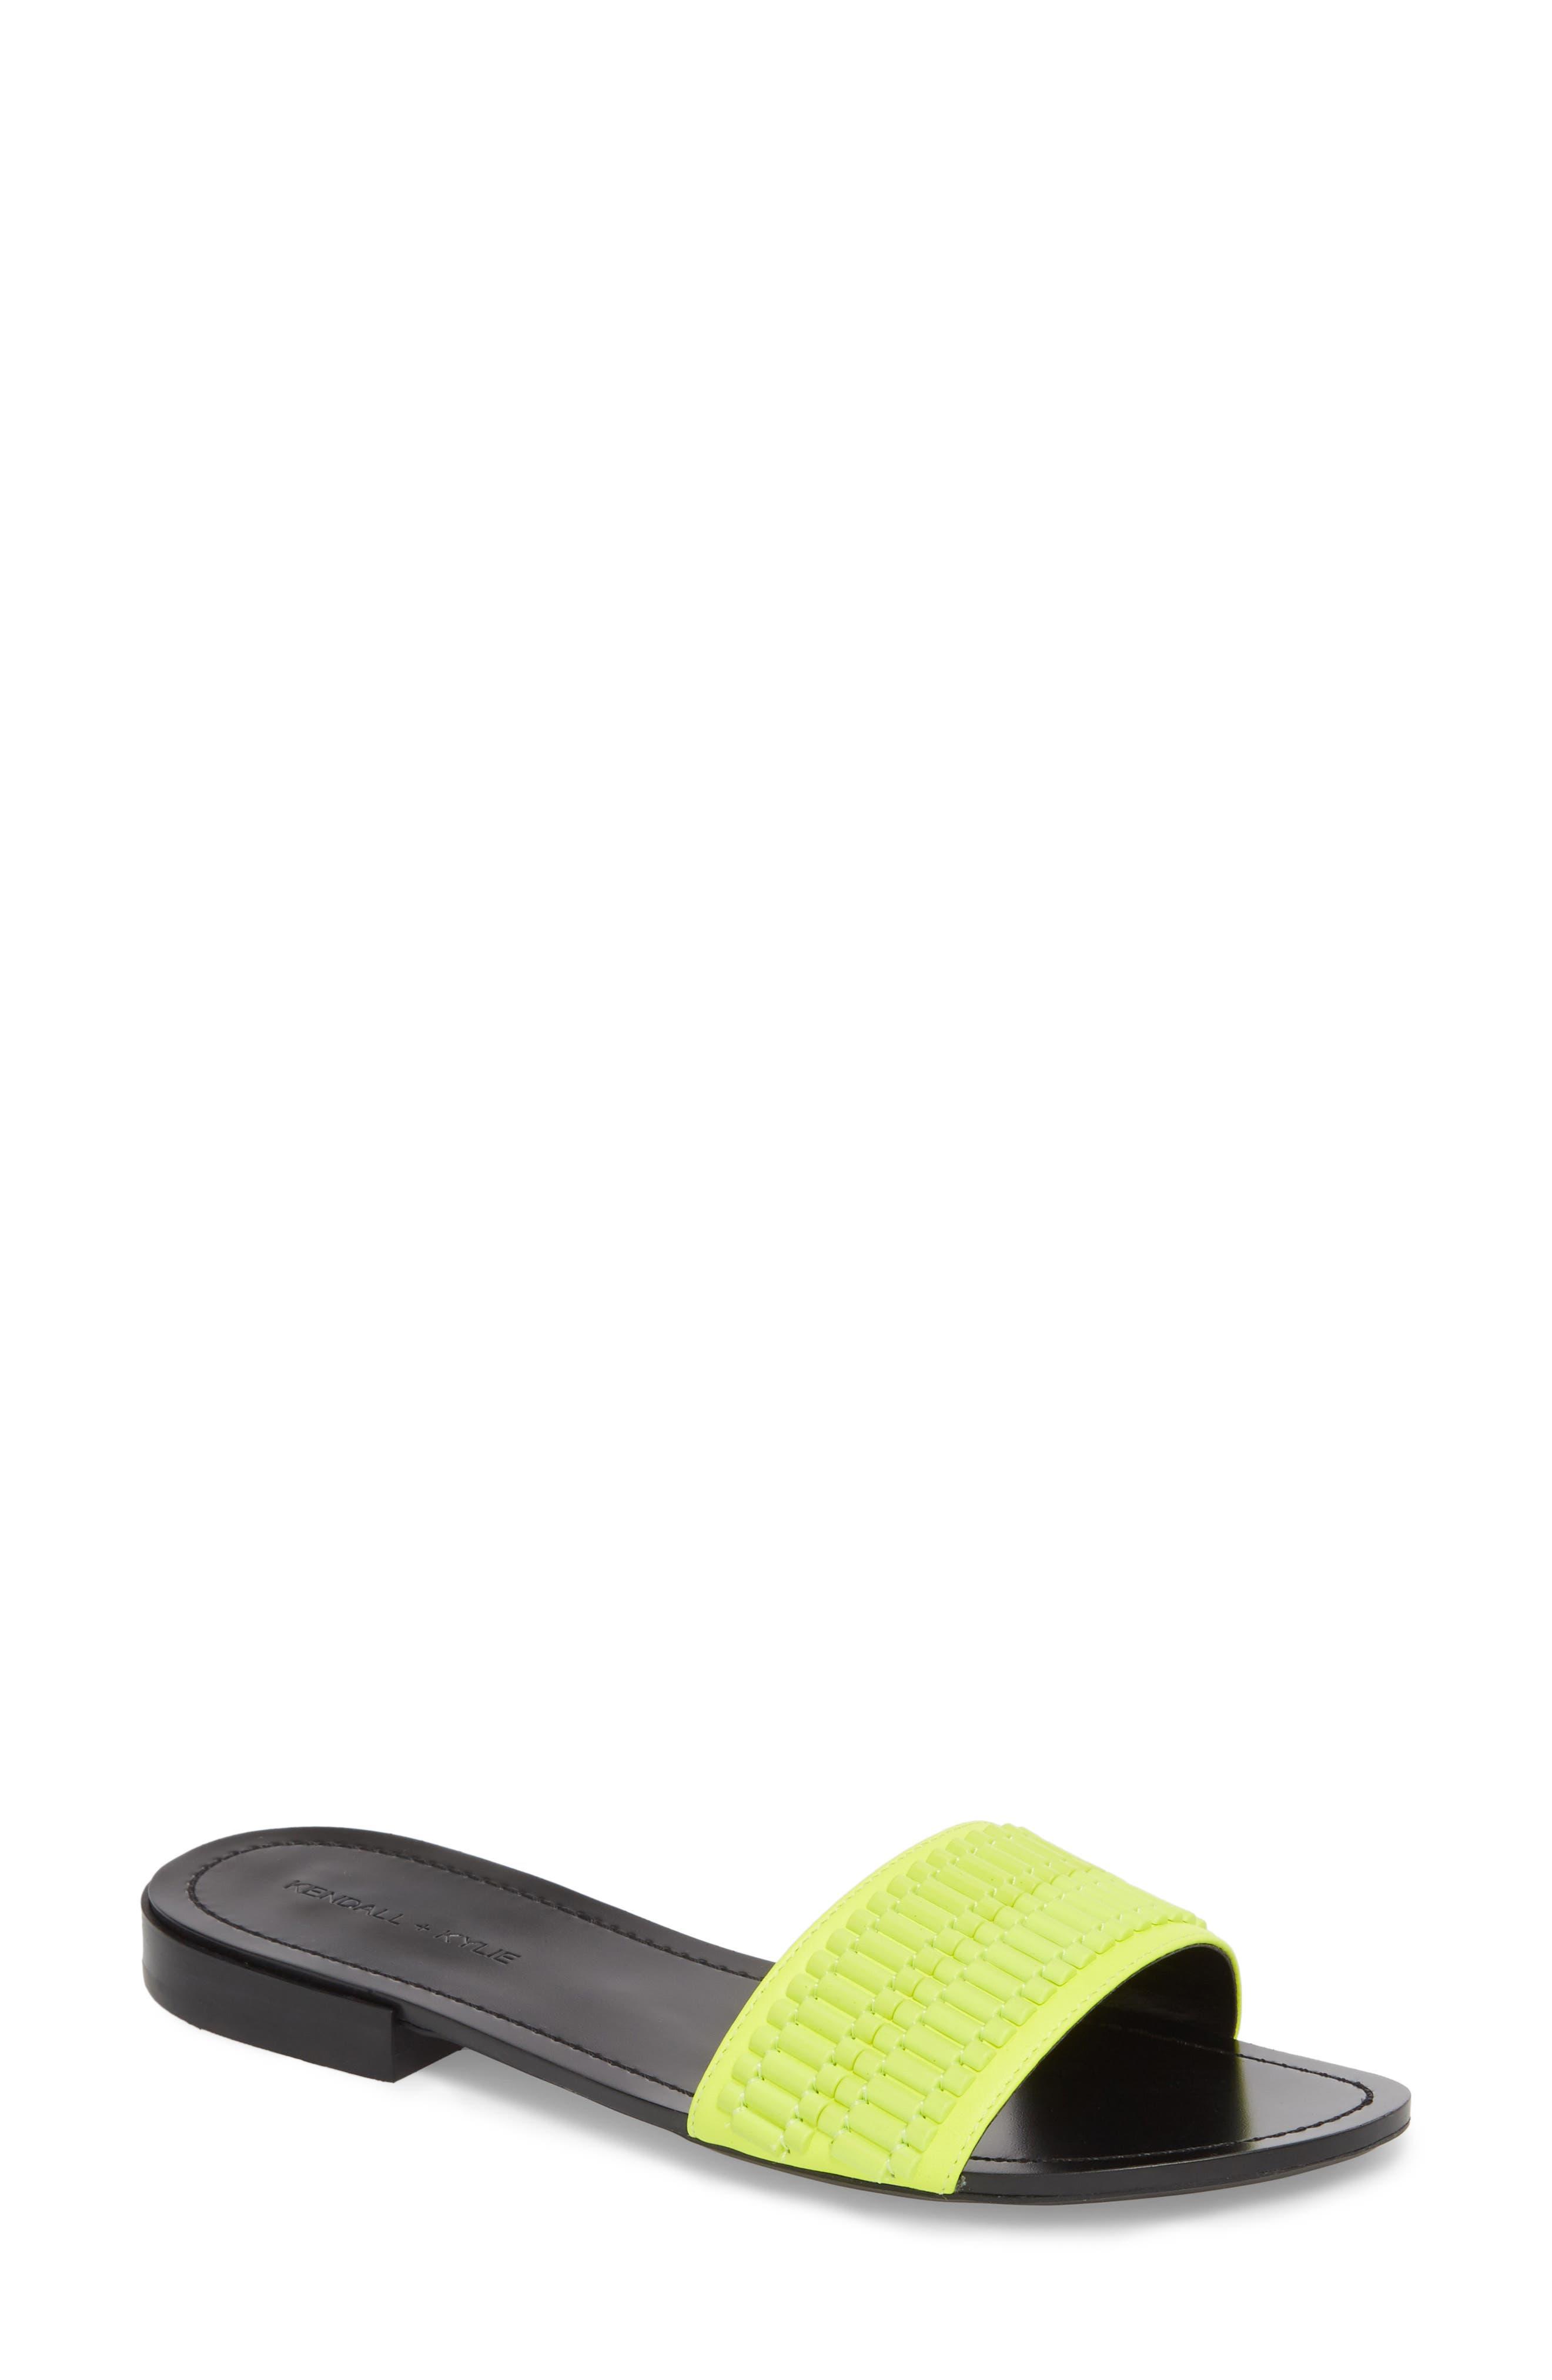 Kennedy Slide Sandal,                             Main thumbnail 1, color,                             Fluorescent Yellow/ Yellow